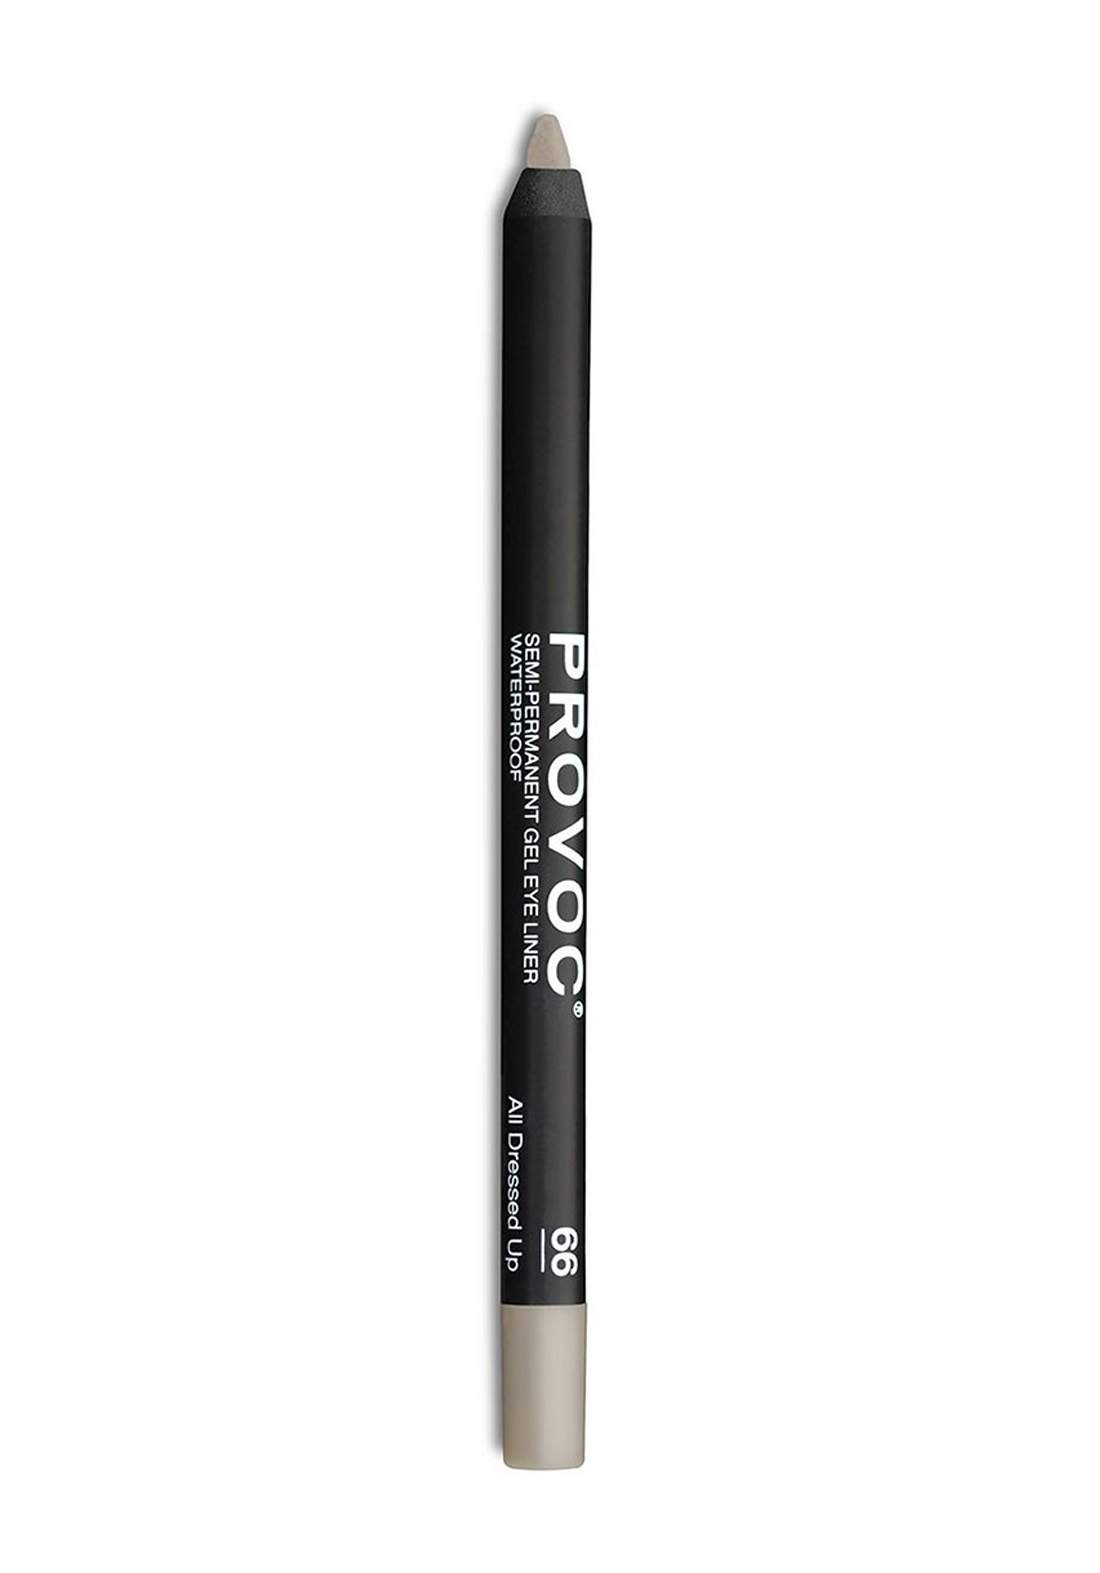 Provoc 353-0030 Semi-Permanent Gel Eye Liner Waterproof Pencil No.66 All Dressed Up قلم محدد العيون